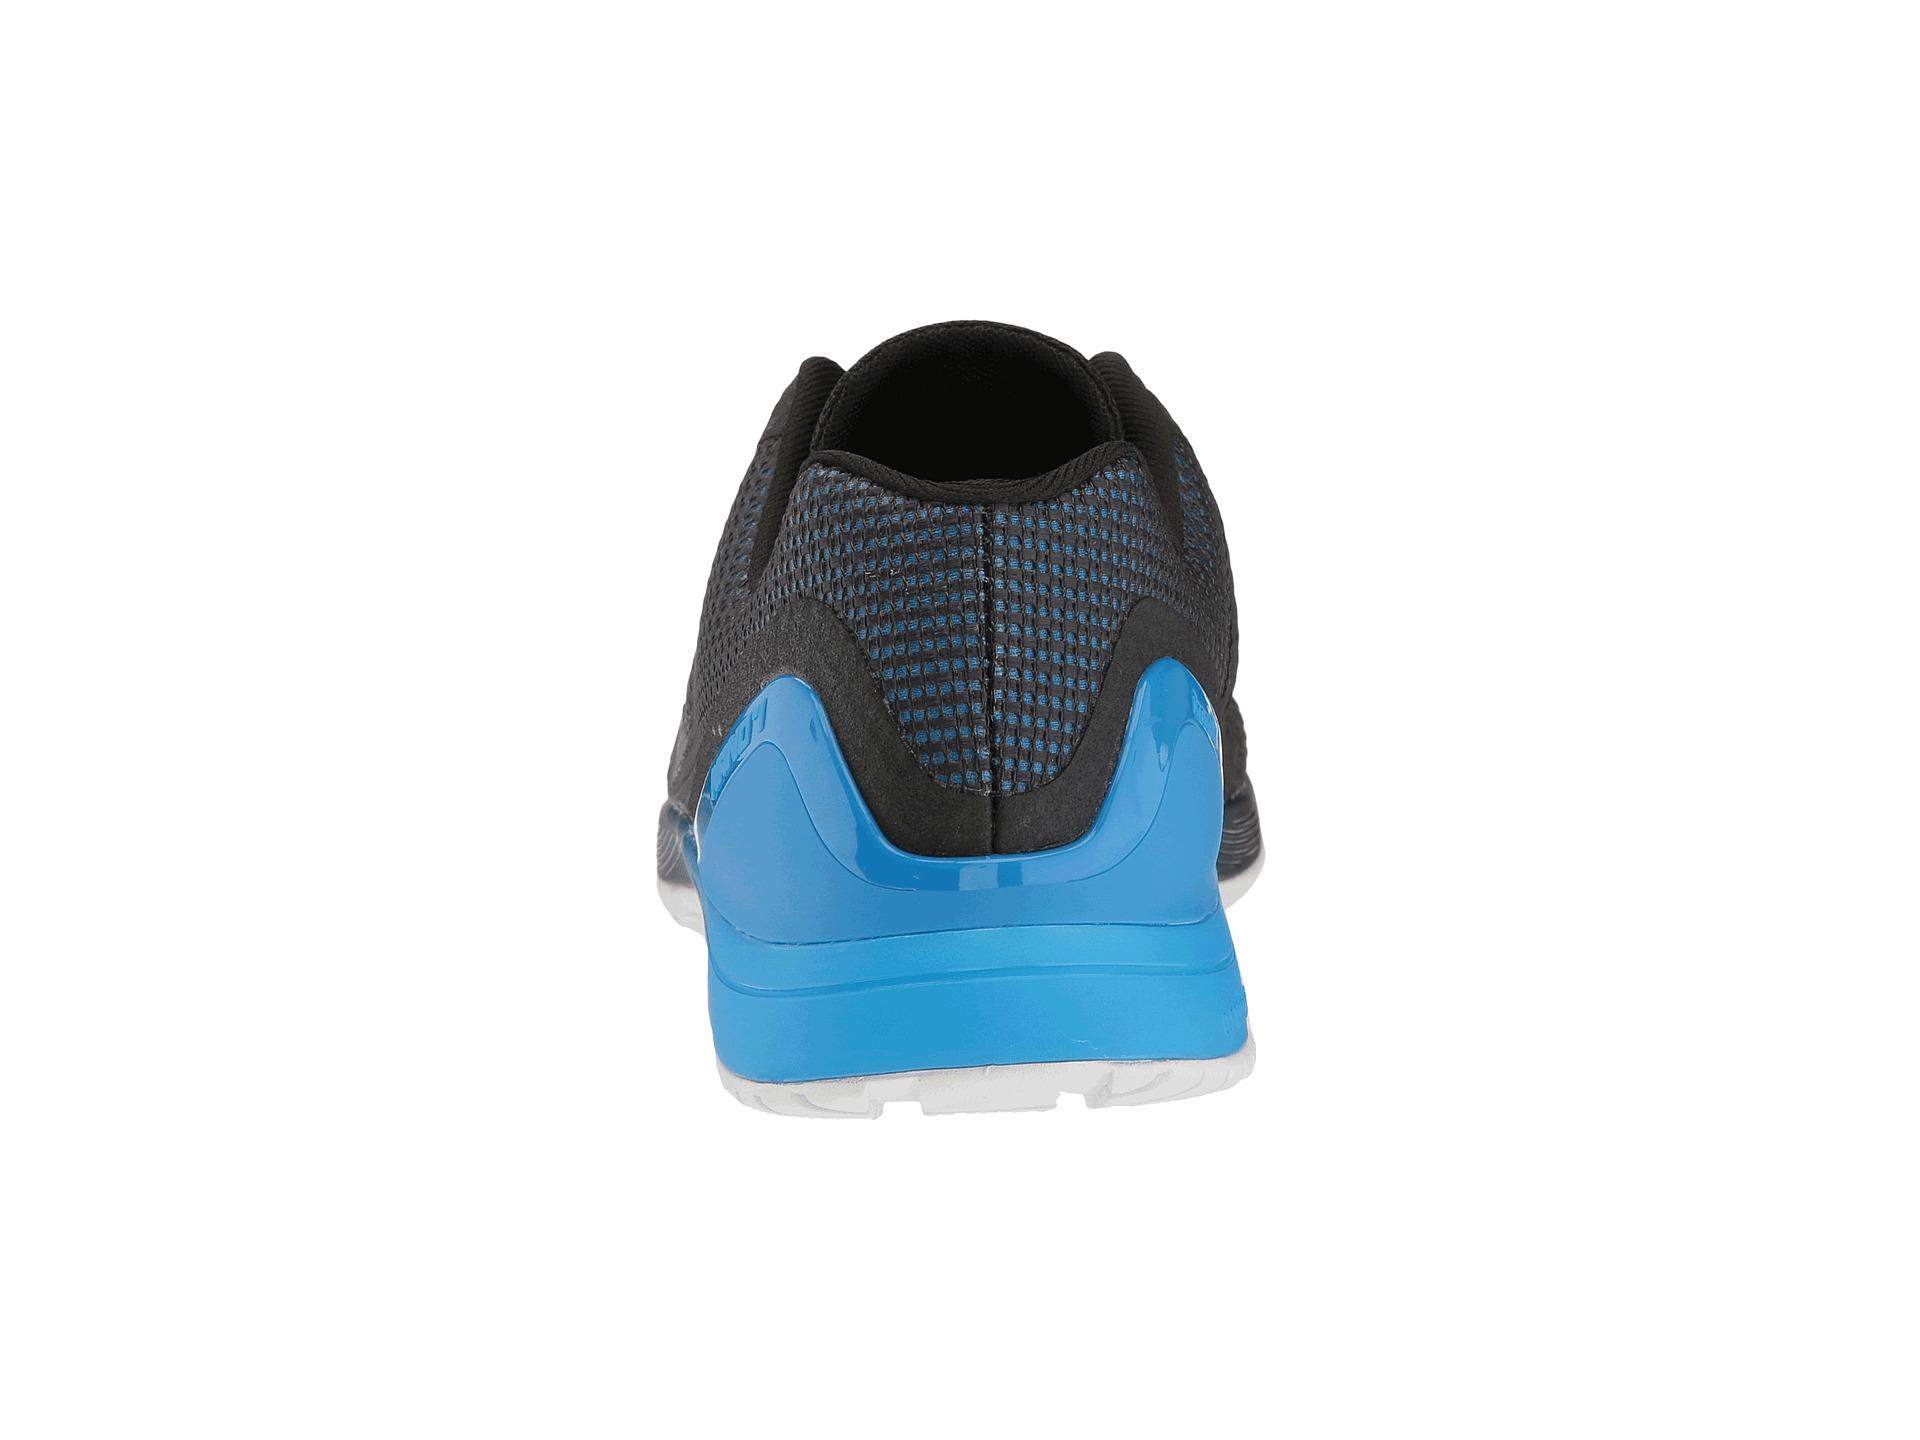 Reebok Crossfit 174 Nano 7 0 Blue Beam Horizon Blue Black